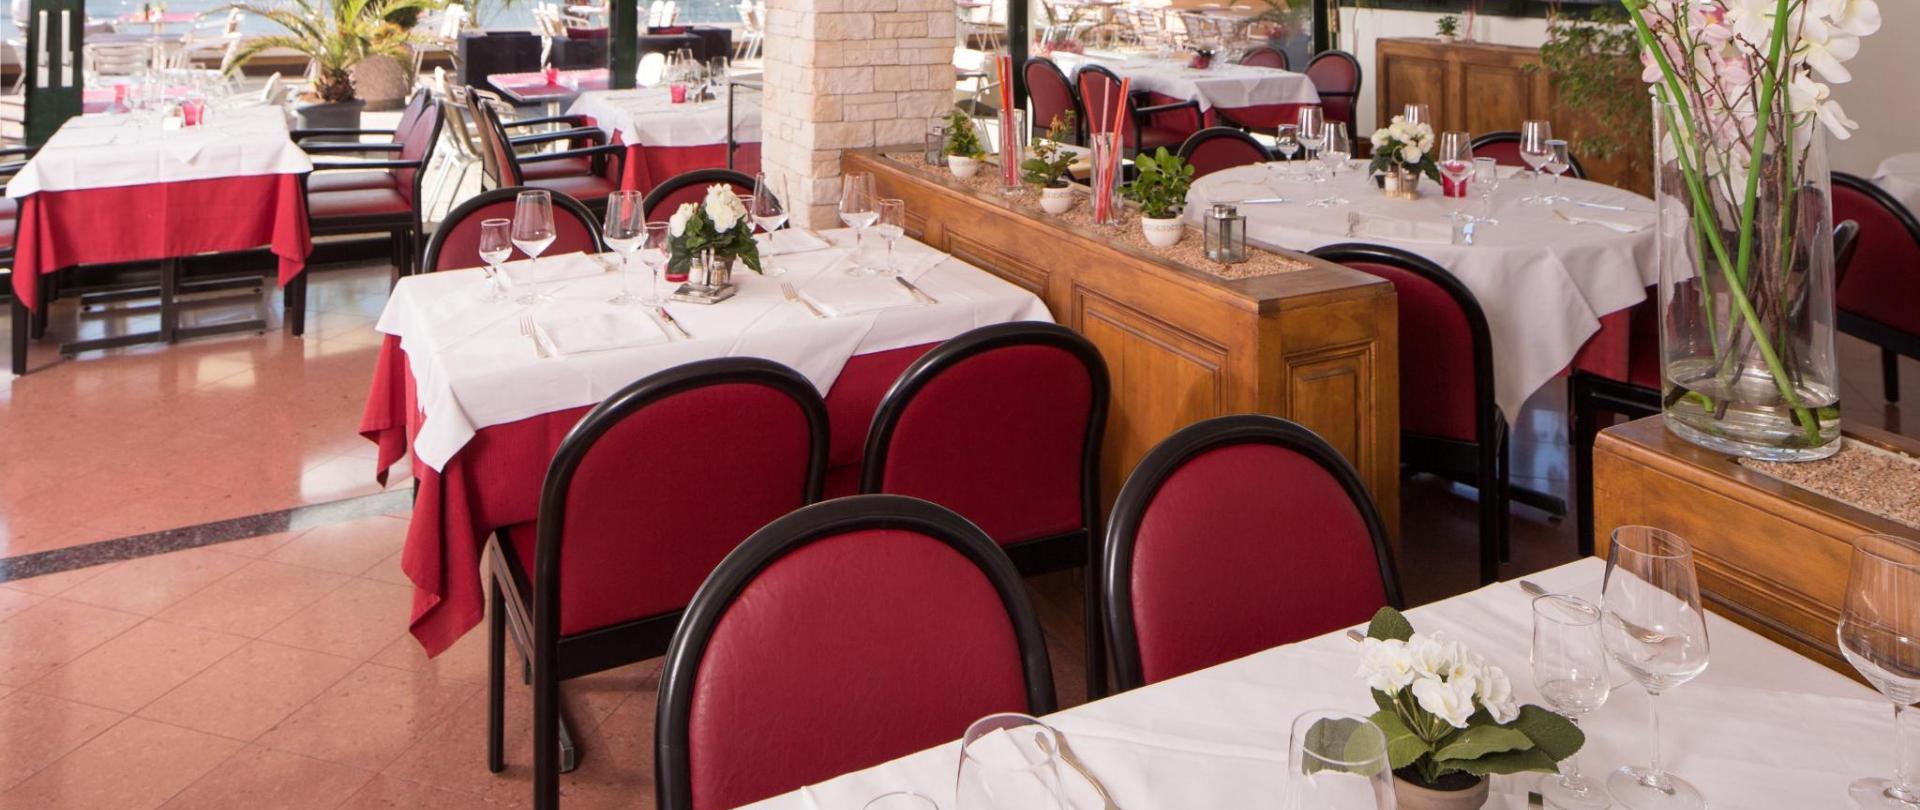 hotel-campione-bissone-ristorante.jpg